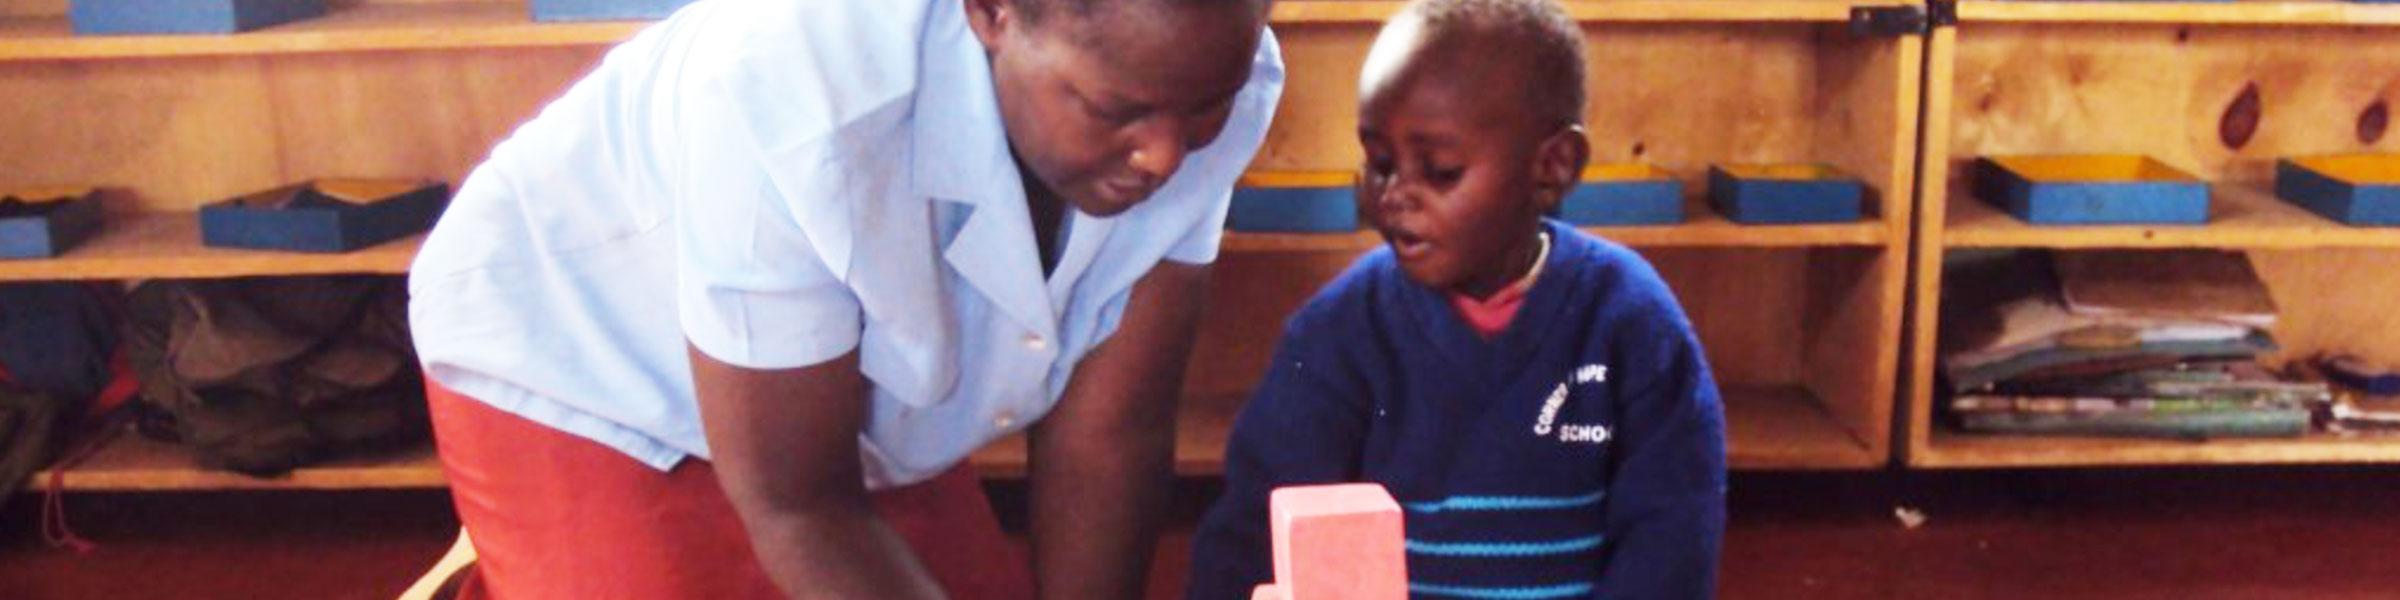 East Pokot Montessori Teacher and Child